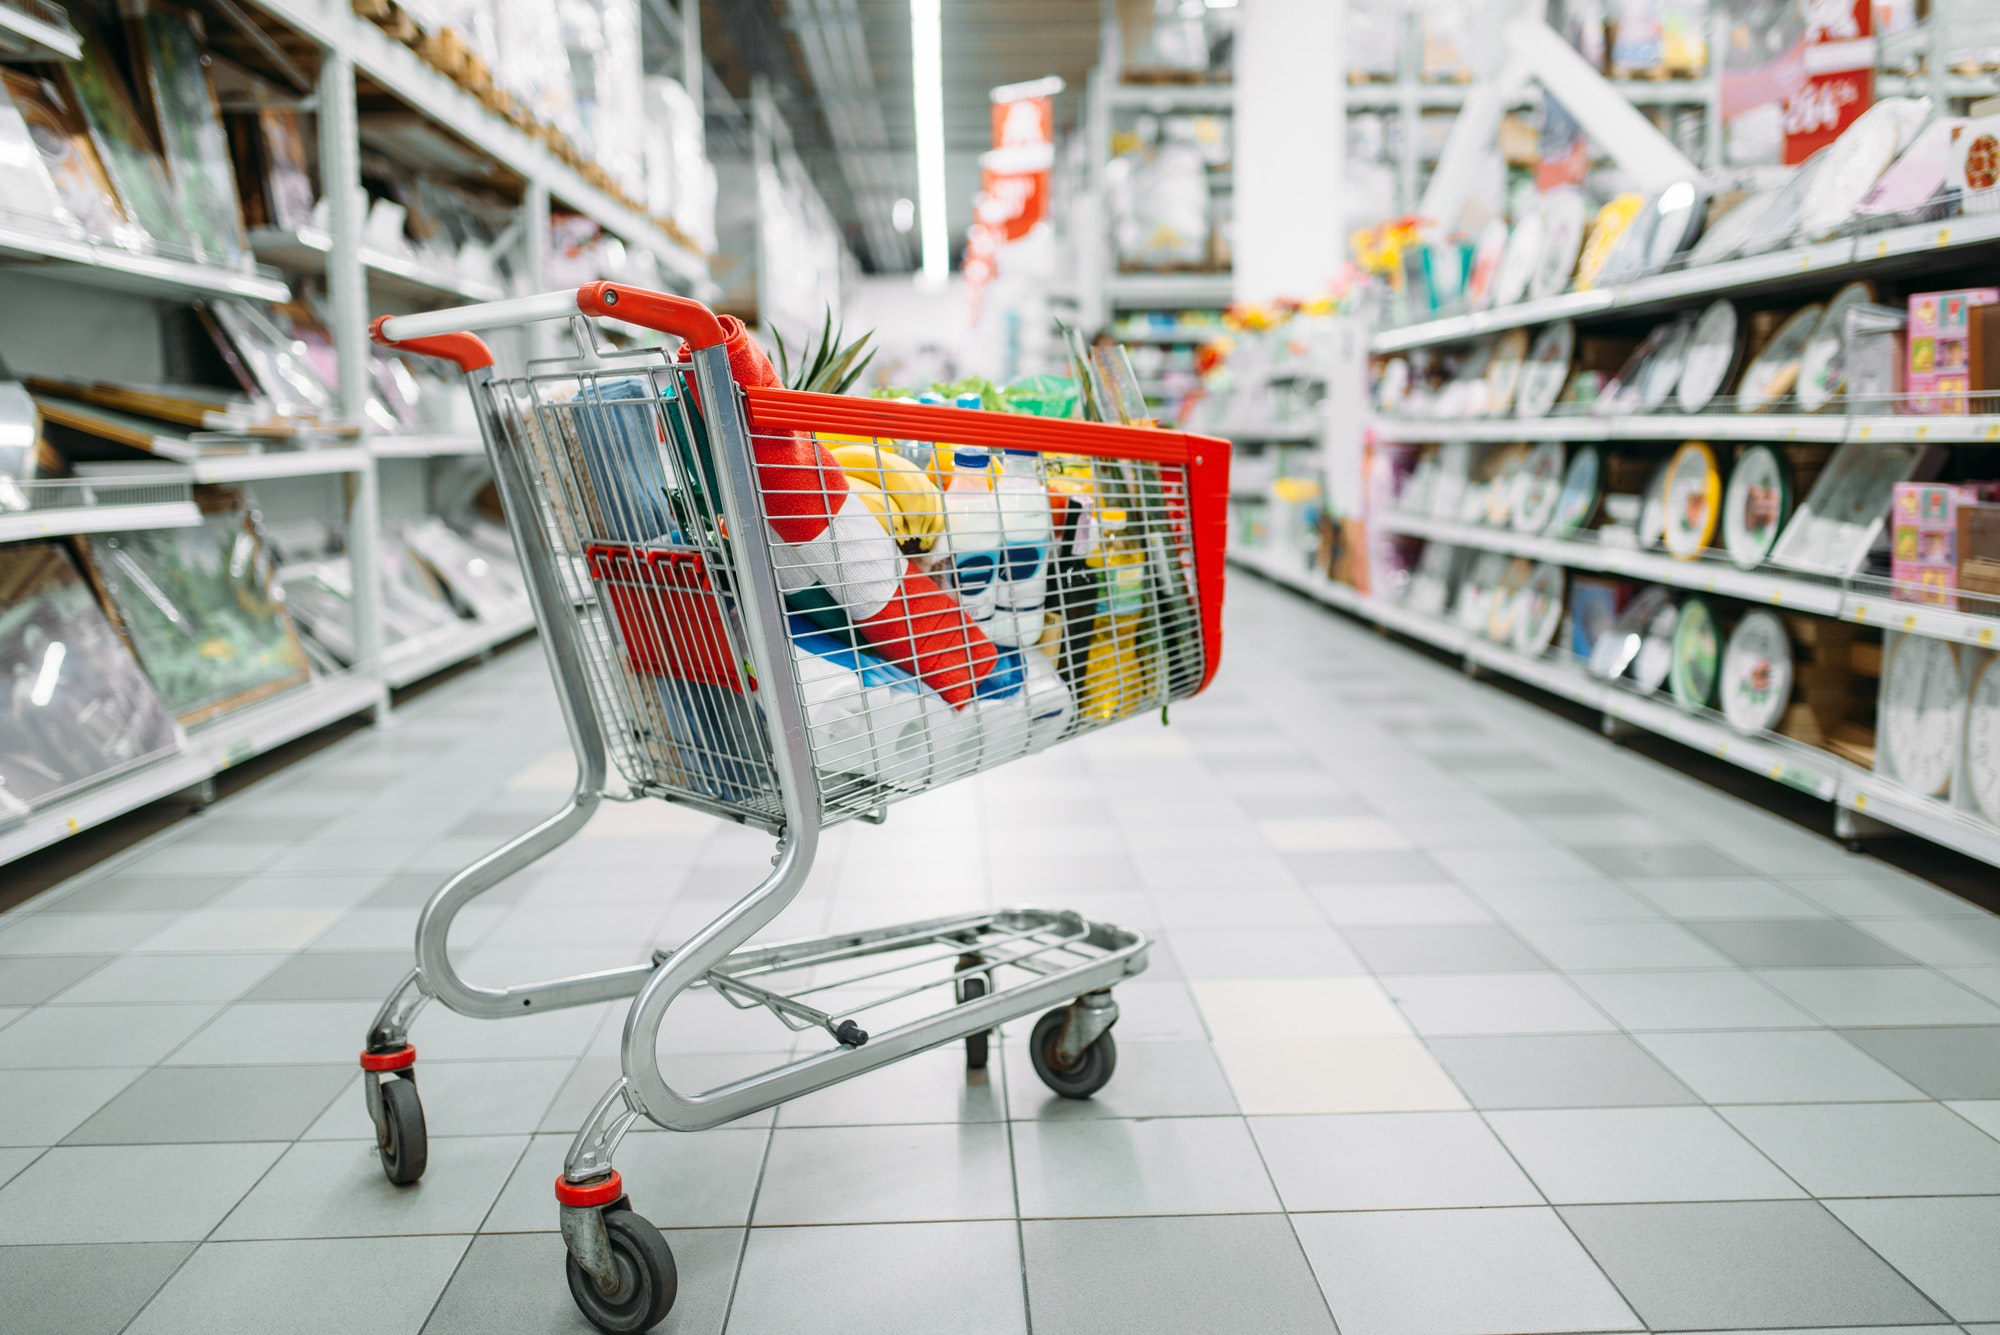 Supermarkt Immobilien Baumarkt Immobilien Nahversorger Immobilien: REBA IMMOBILIEN AG